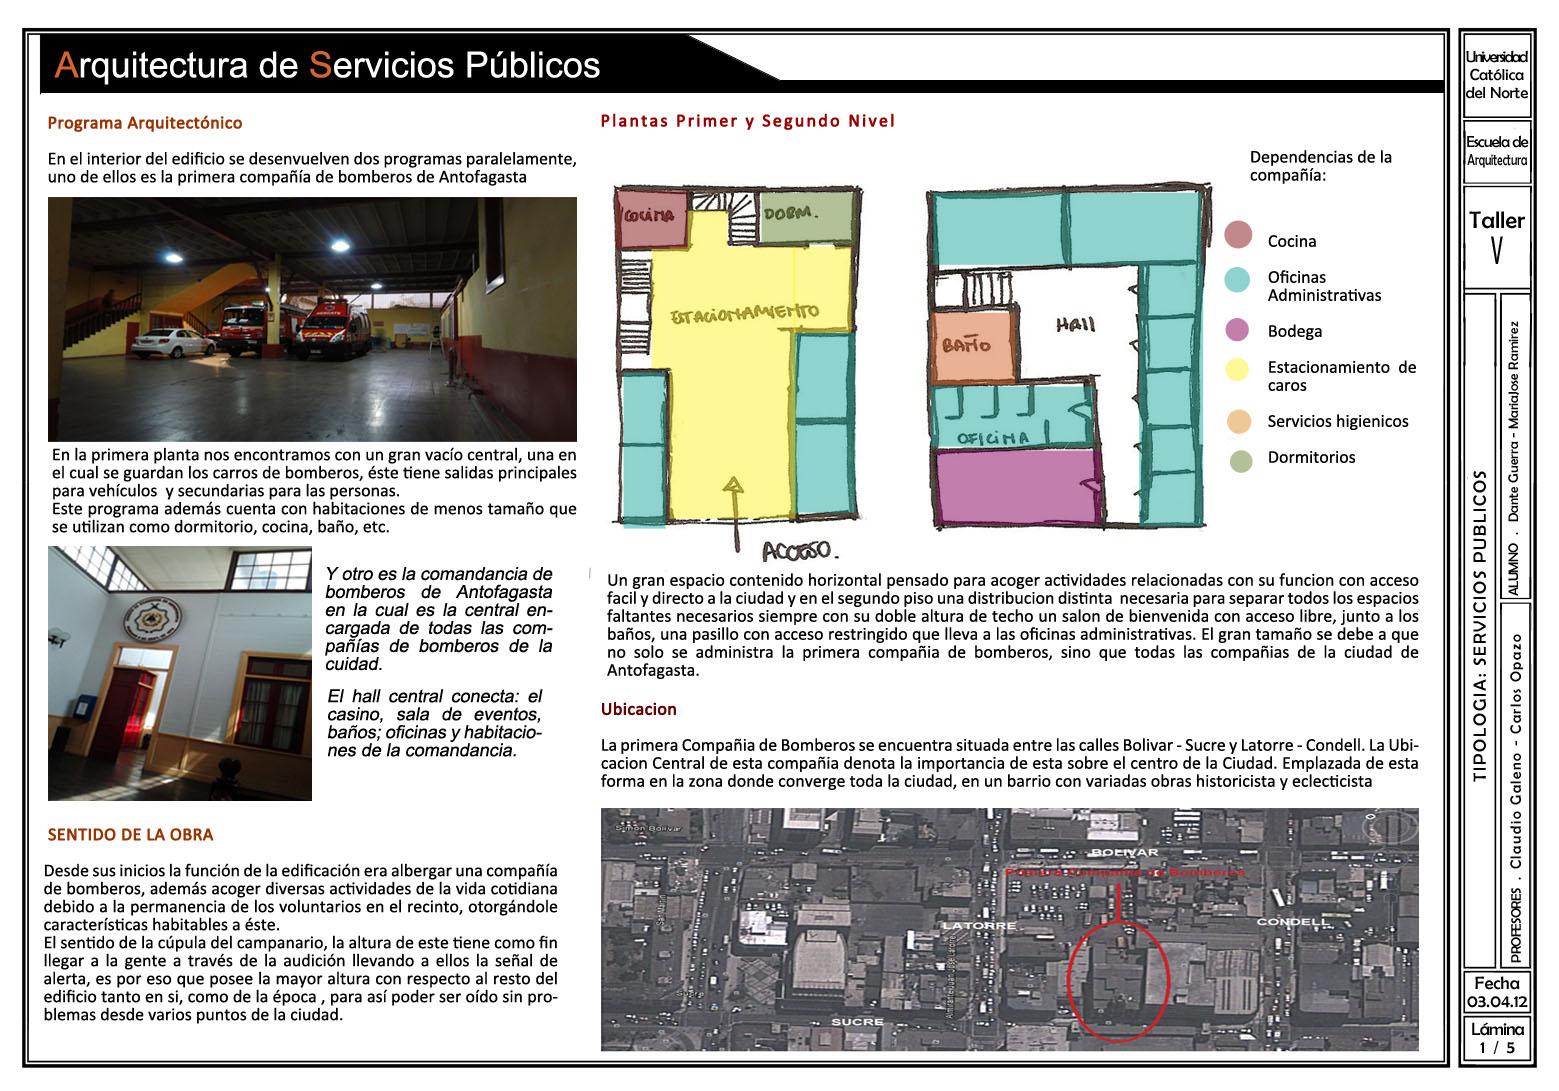 Taller de arquitectura 5 lenguaje 1er semestre de 2012 for Arquitectura online gratis